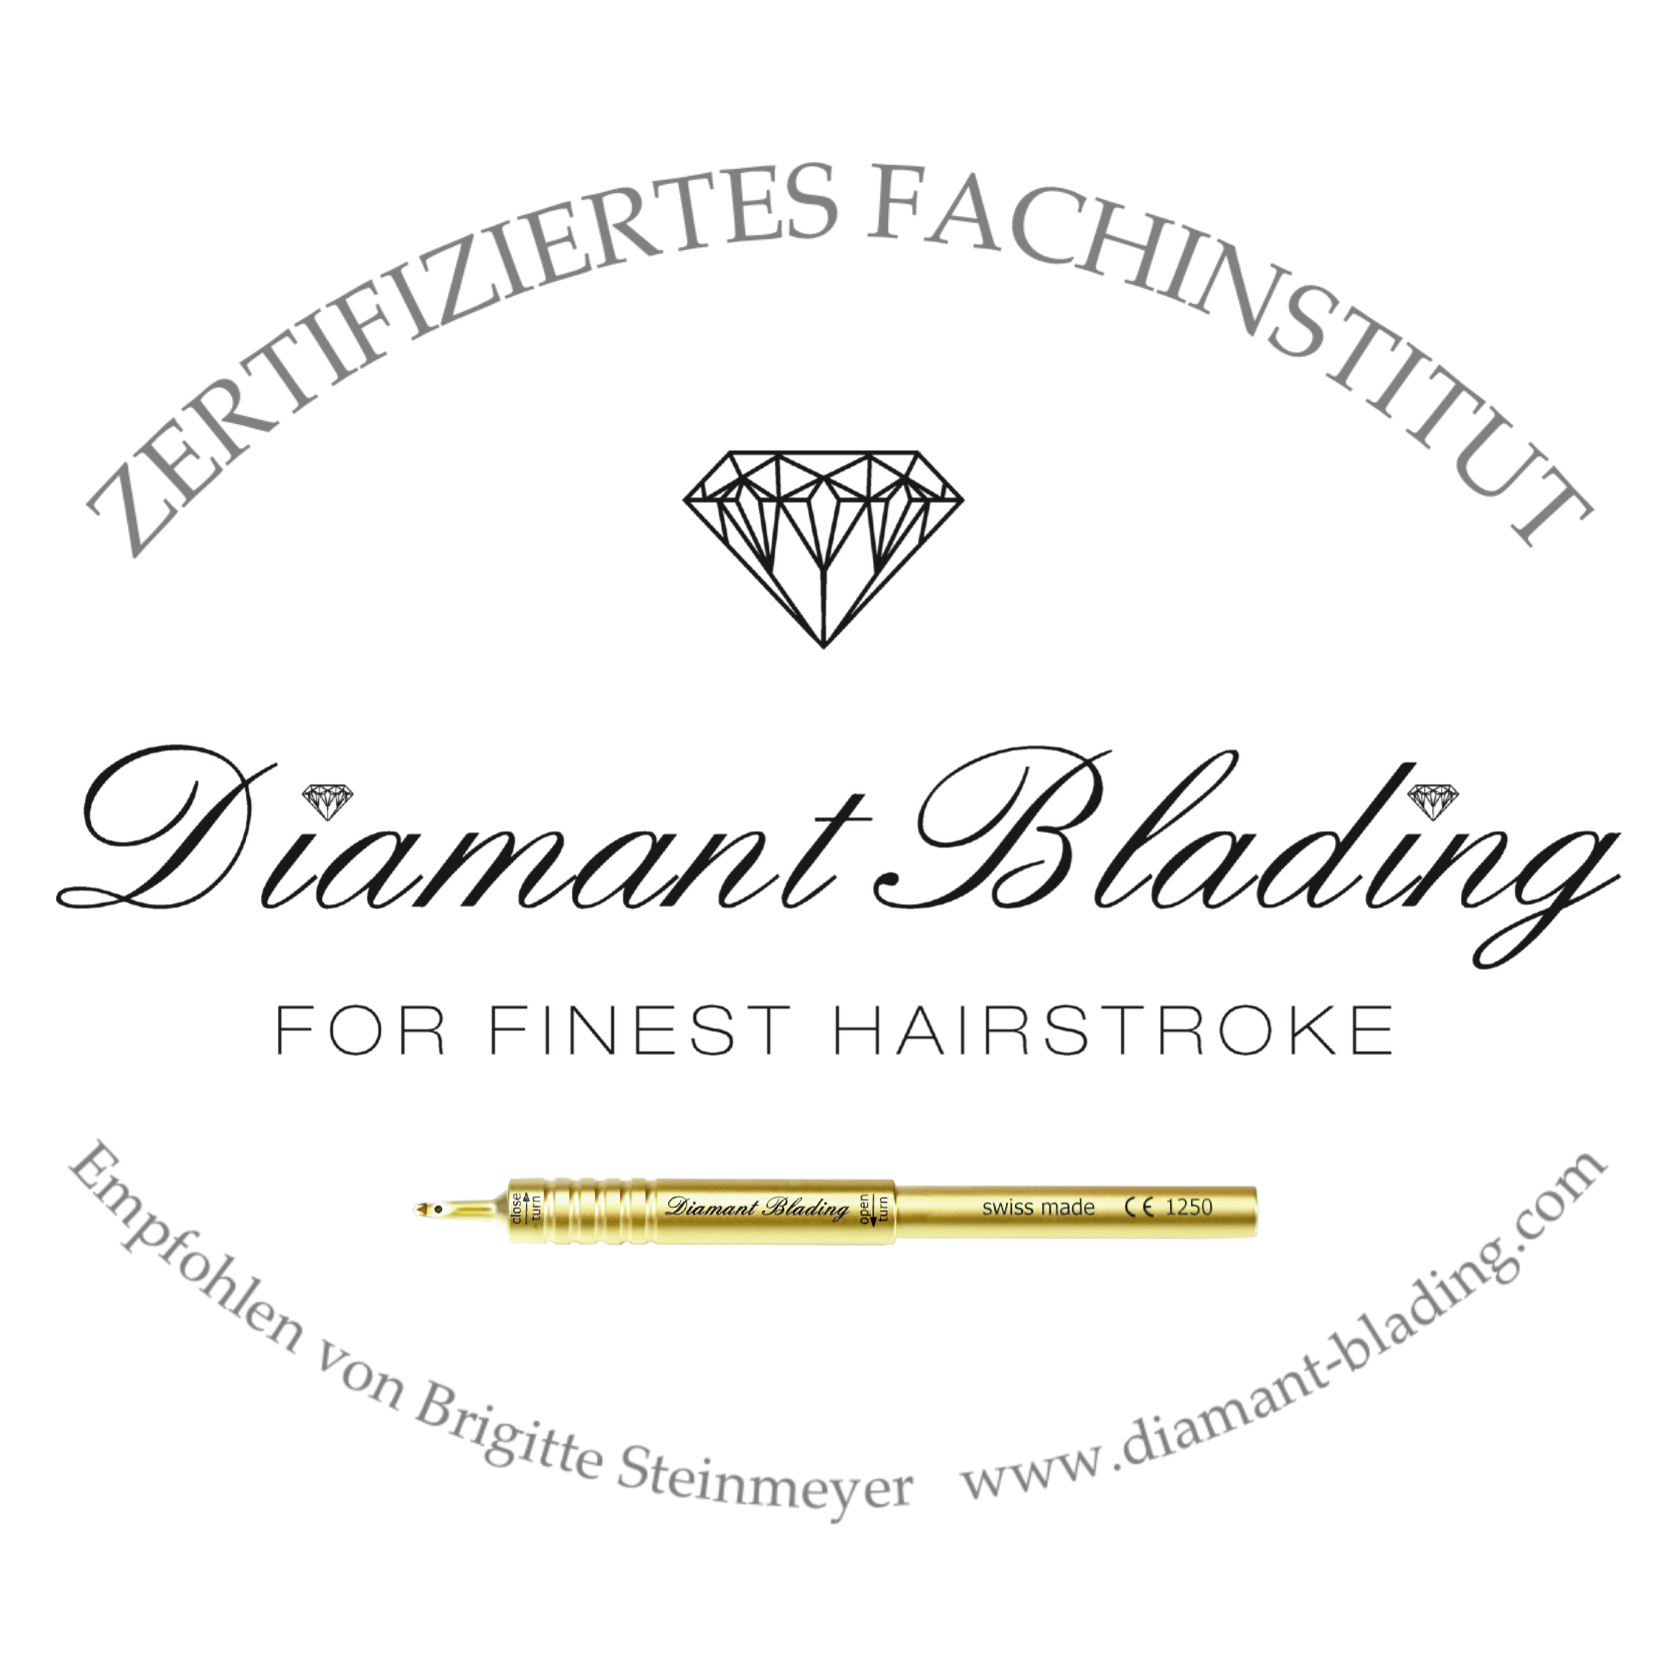 Diamant Blading Fachstudio |KroMED Hamburg |